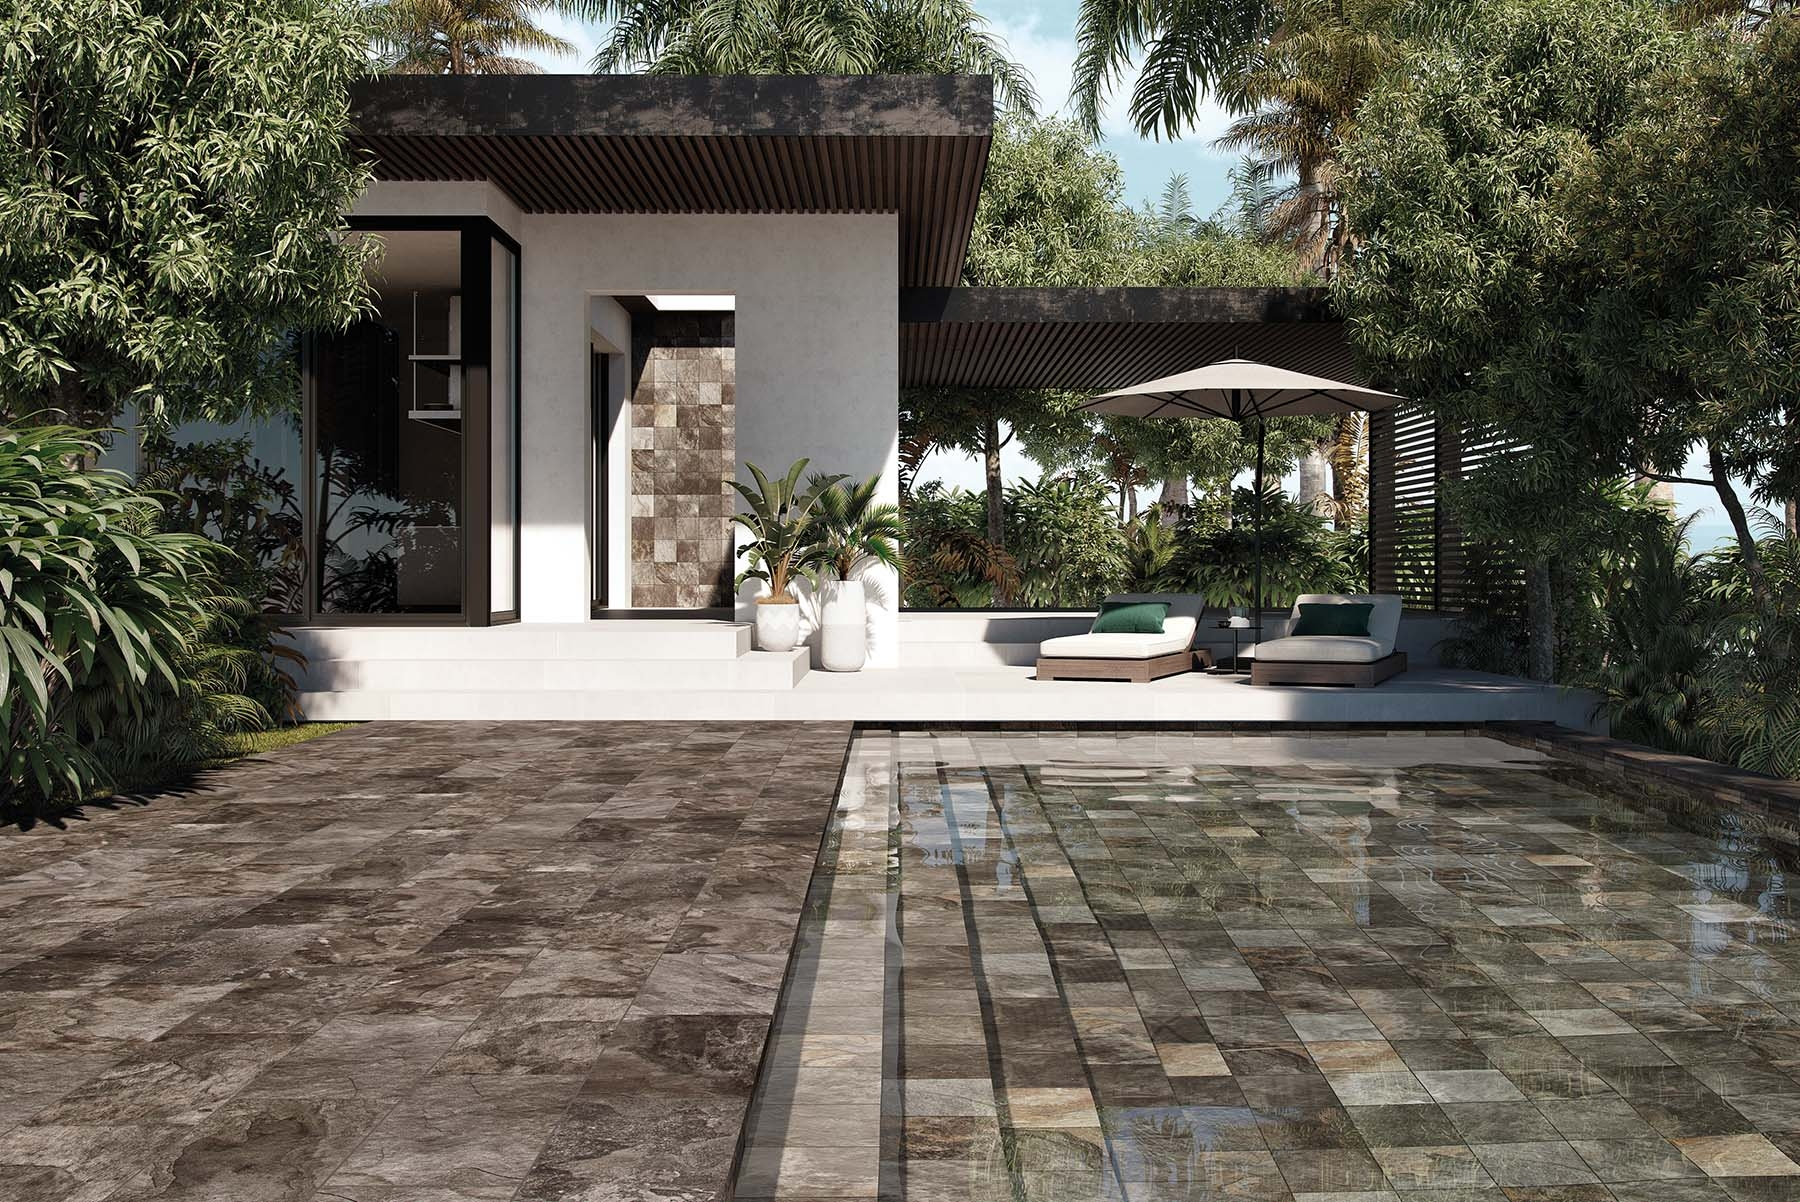 Bali Stone de Undefasa.